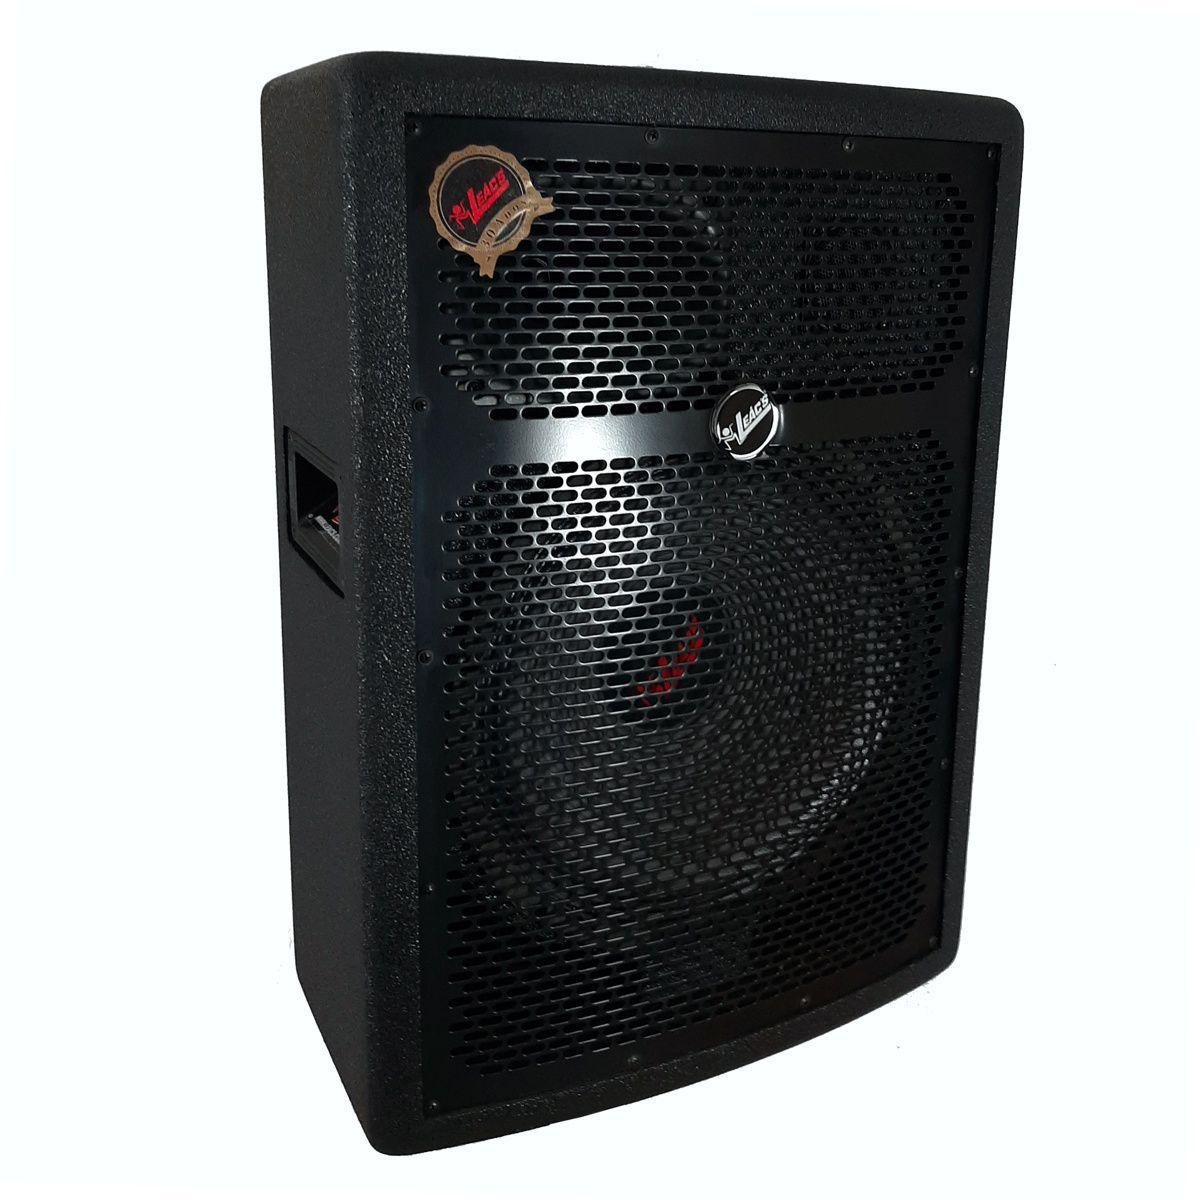 Sistema Pa Sub Woofer Leacs Sli1500 + Caixa Ativa Passiva Fit320a + Retorno Ativo Passivo Fit160a 1530w Rms